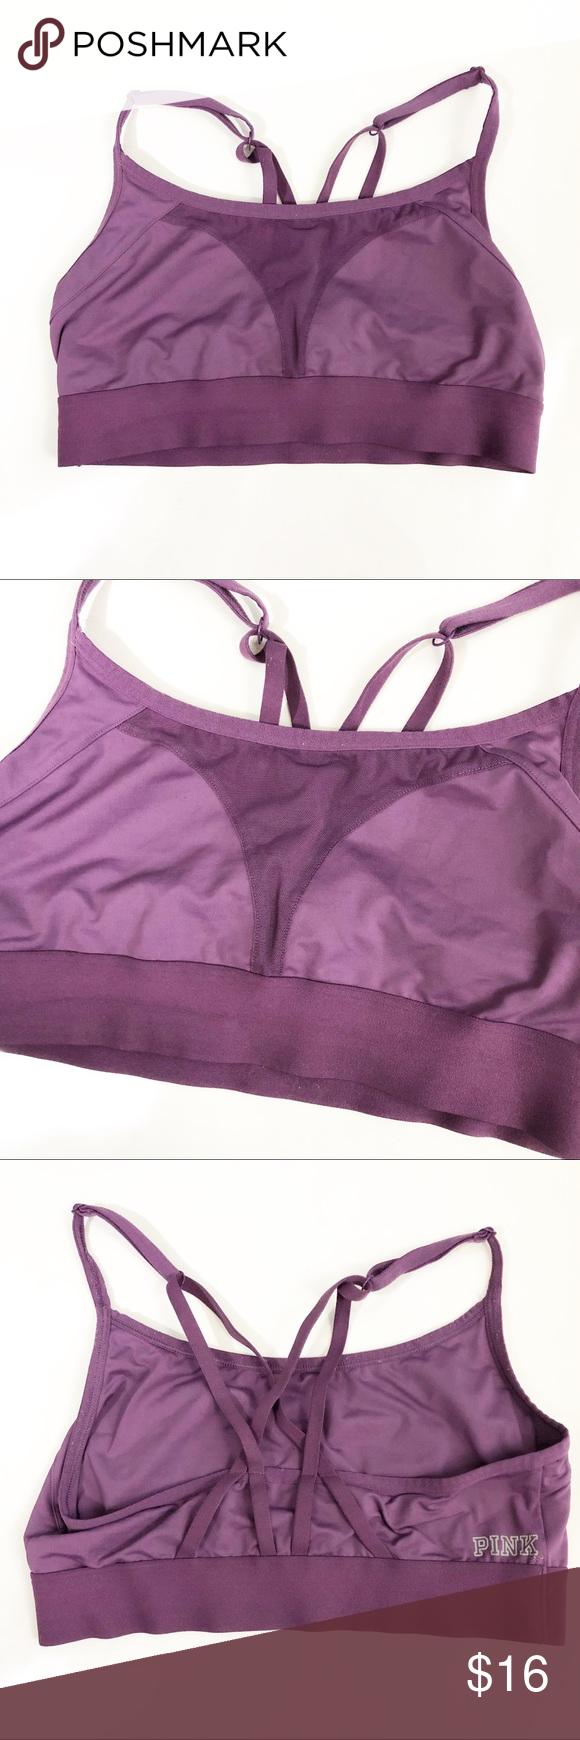 75d9e88ca3 Victoria s Secret PINK ultimate sports bra Purple Victoria s Secret PINK  ultimate sports bra. Strappy back. Size M PINK Victoria s Secret Intimates  ...